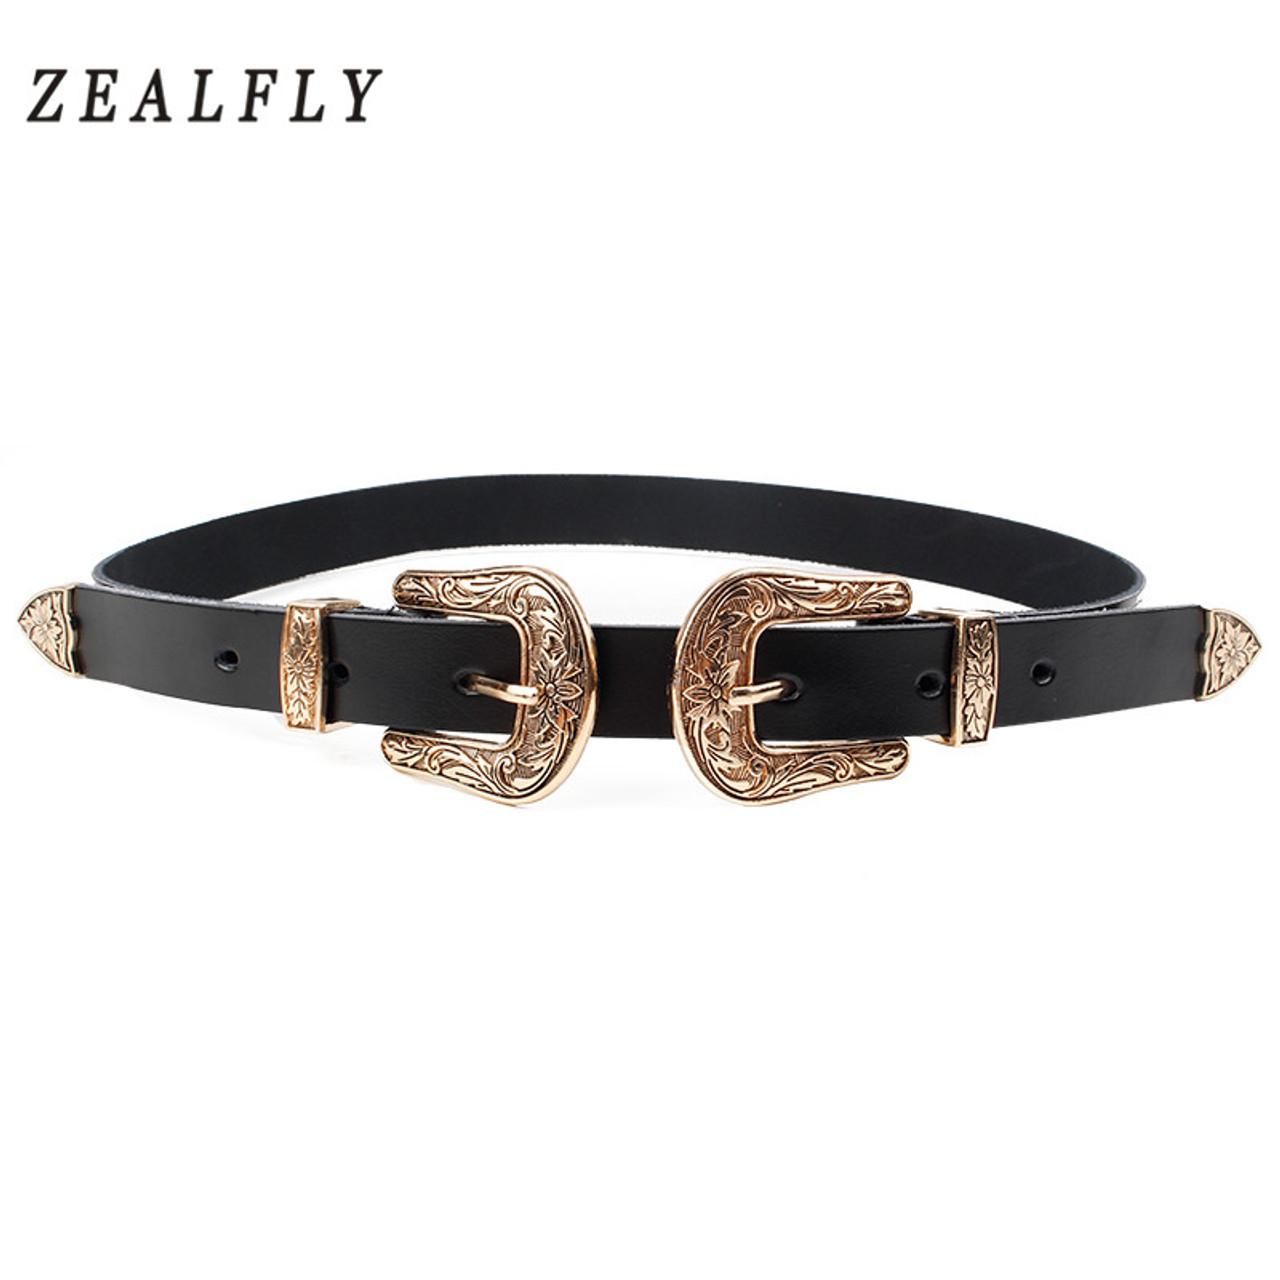 99b69d00c ... Carved Double Metal Pin Buckle Women Belts Vintage High Quality Brand  Designer Belt Jeans Genuine Leather ...